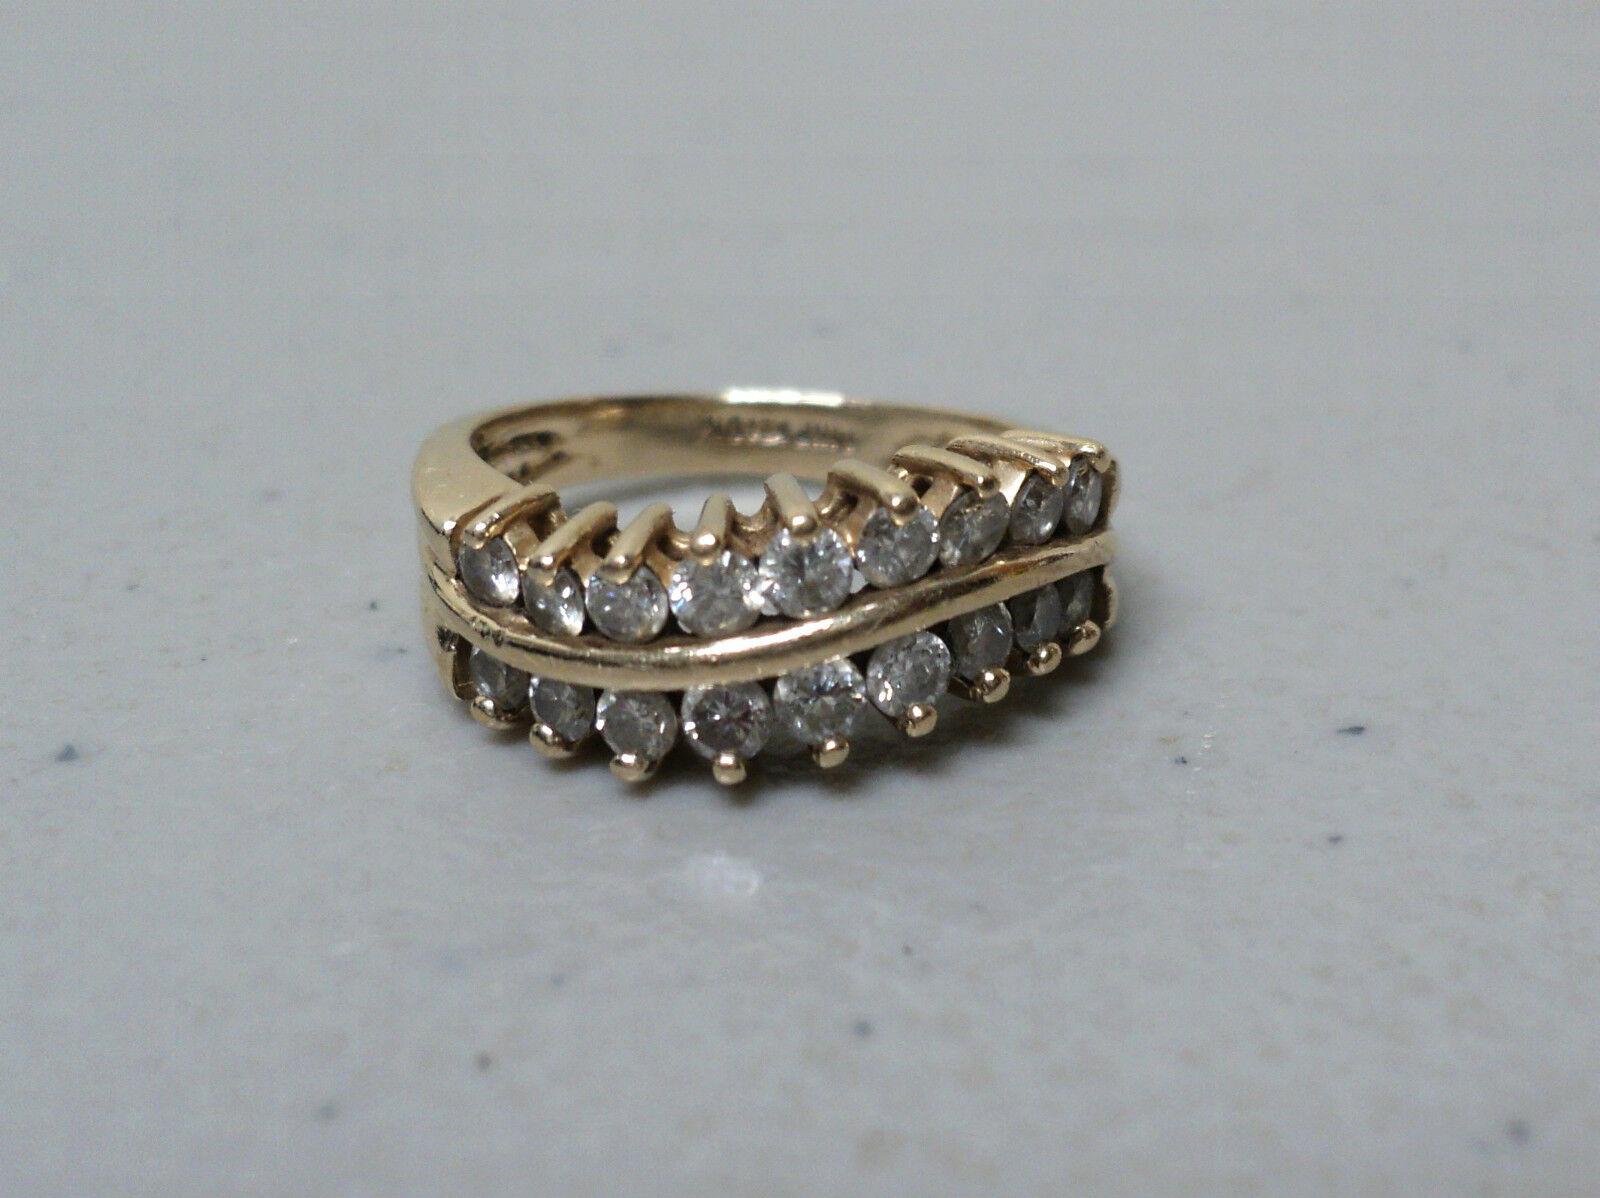 FABULOUS ESTATE 14K gold 1.0 CARAT DIAMOND RING, SIZE 6,  APPRAISED  2000.00